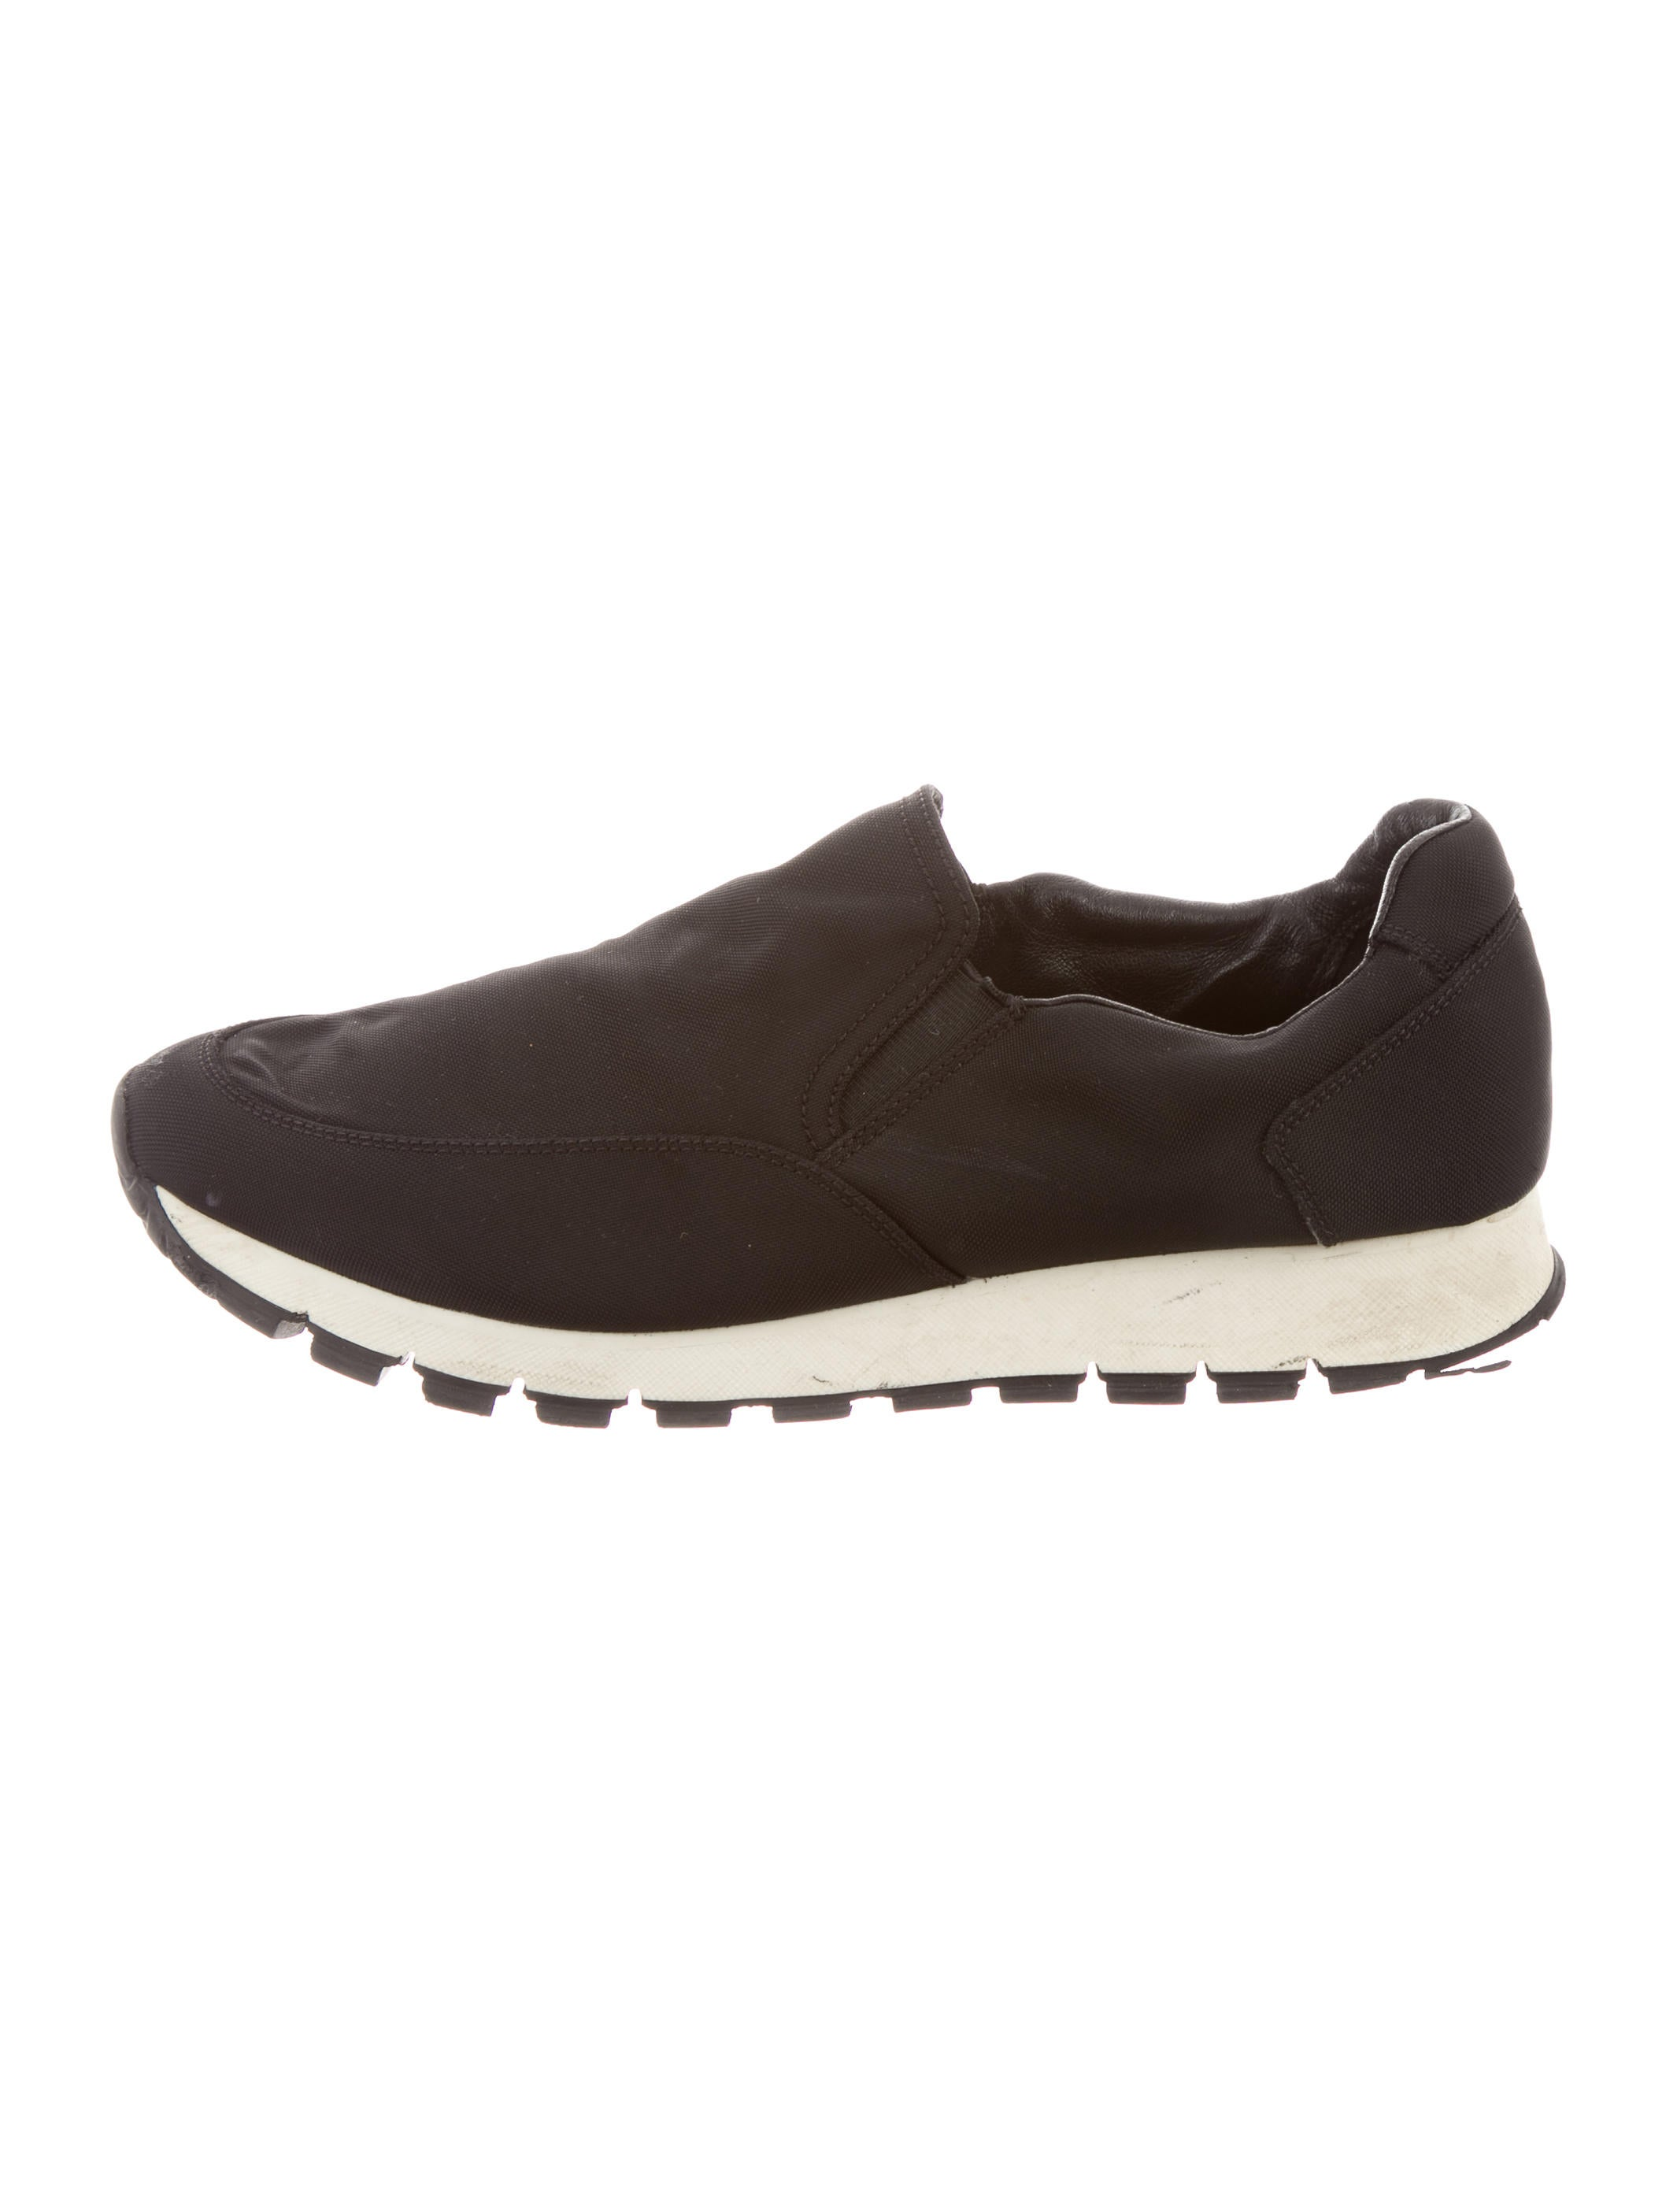 prada sport woven slip on sneakers shoes wpr34297